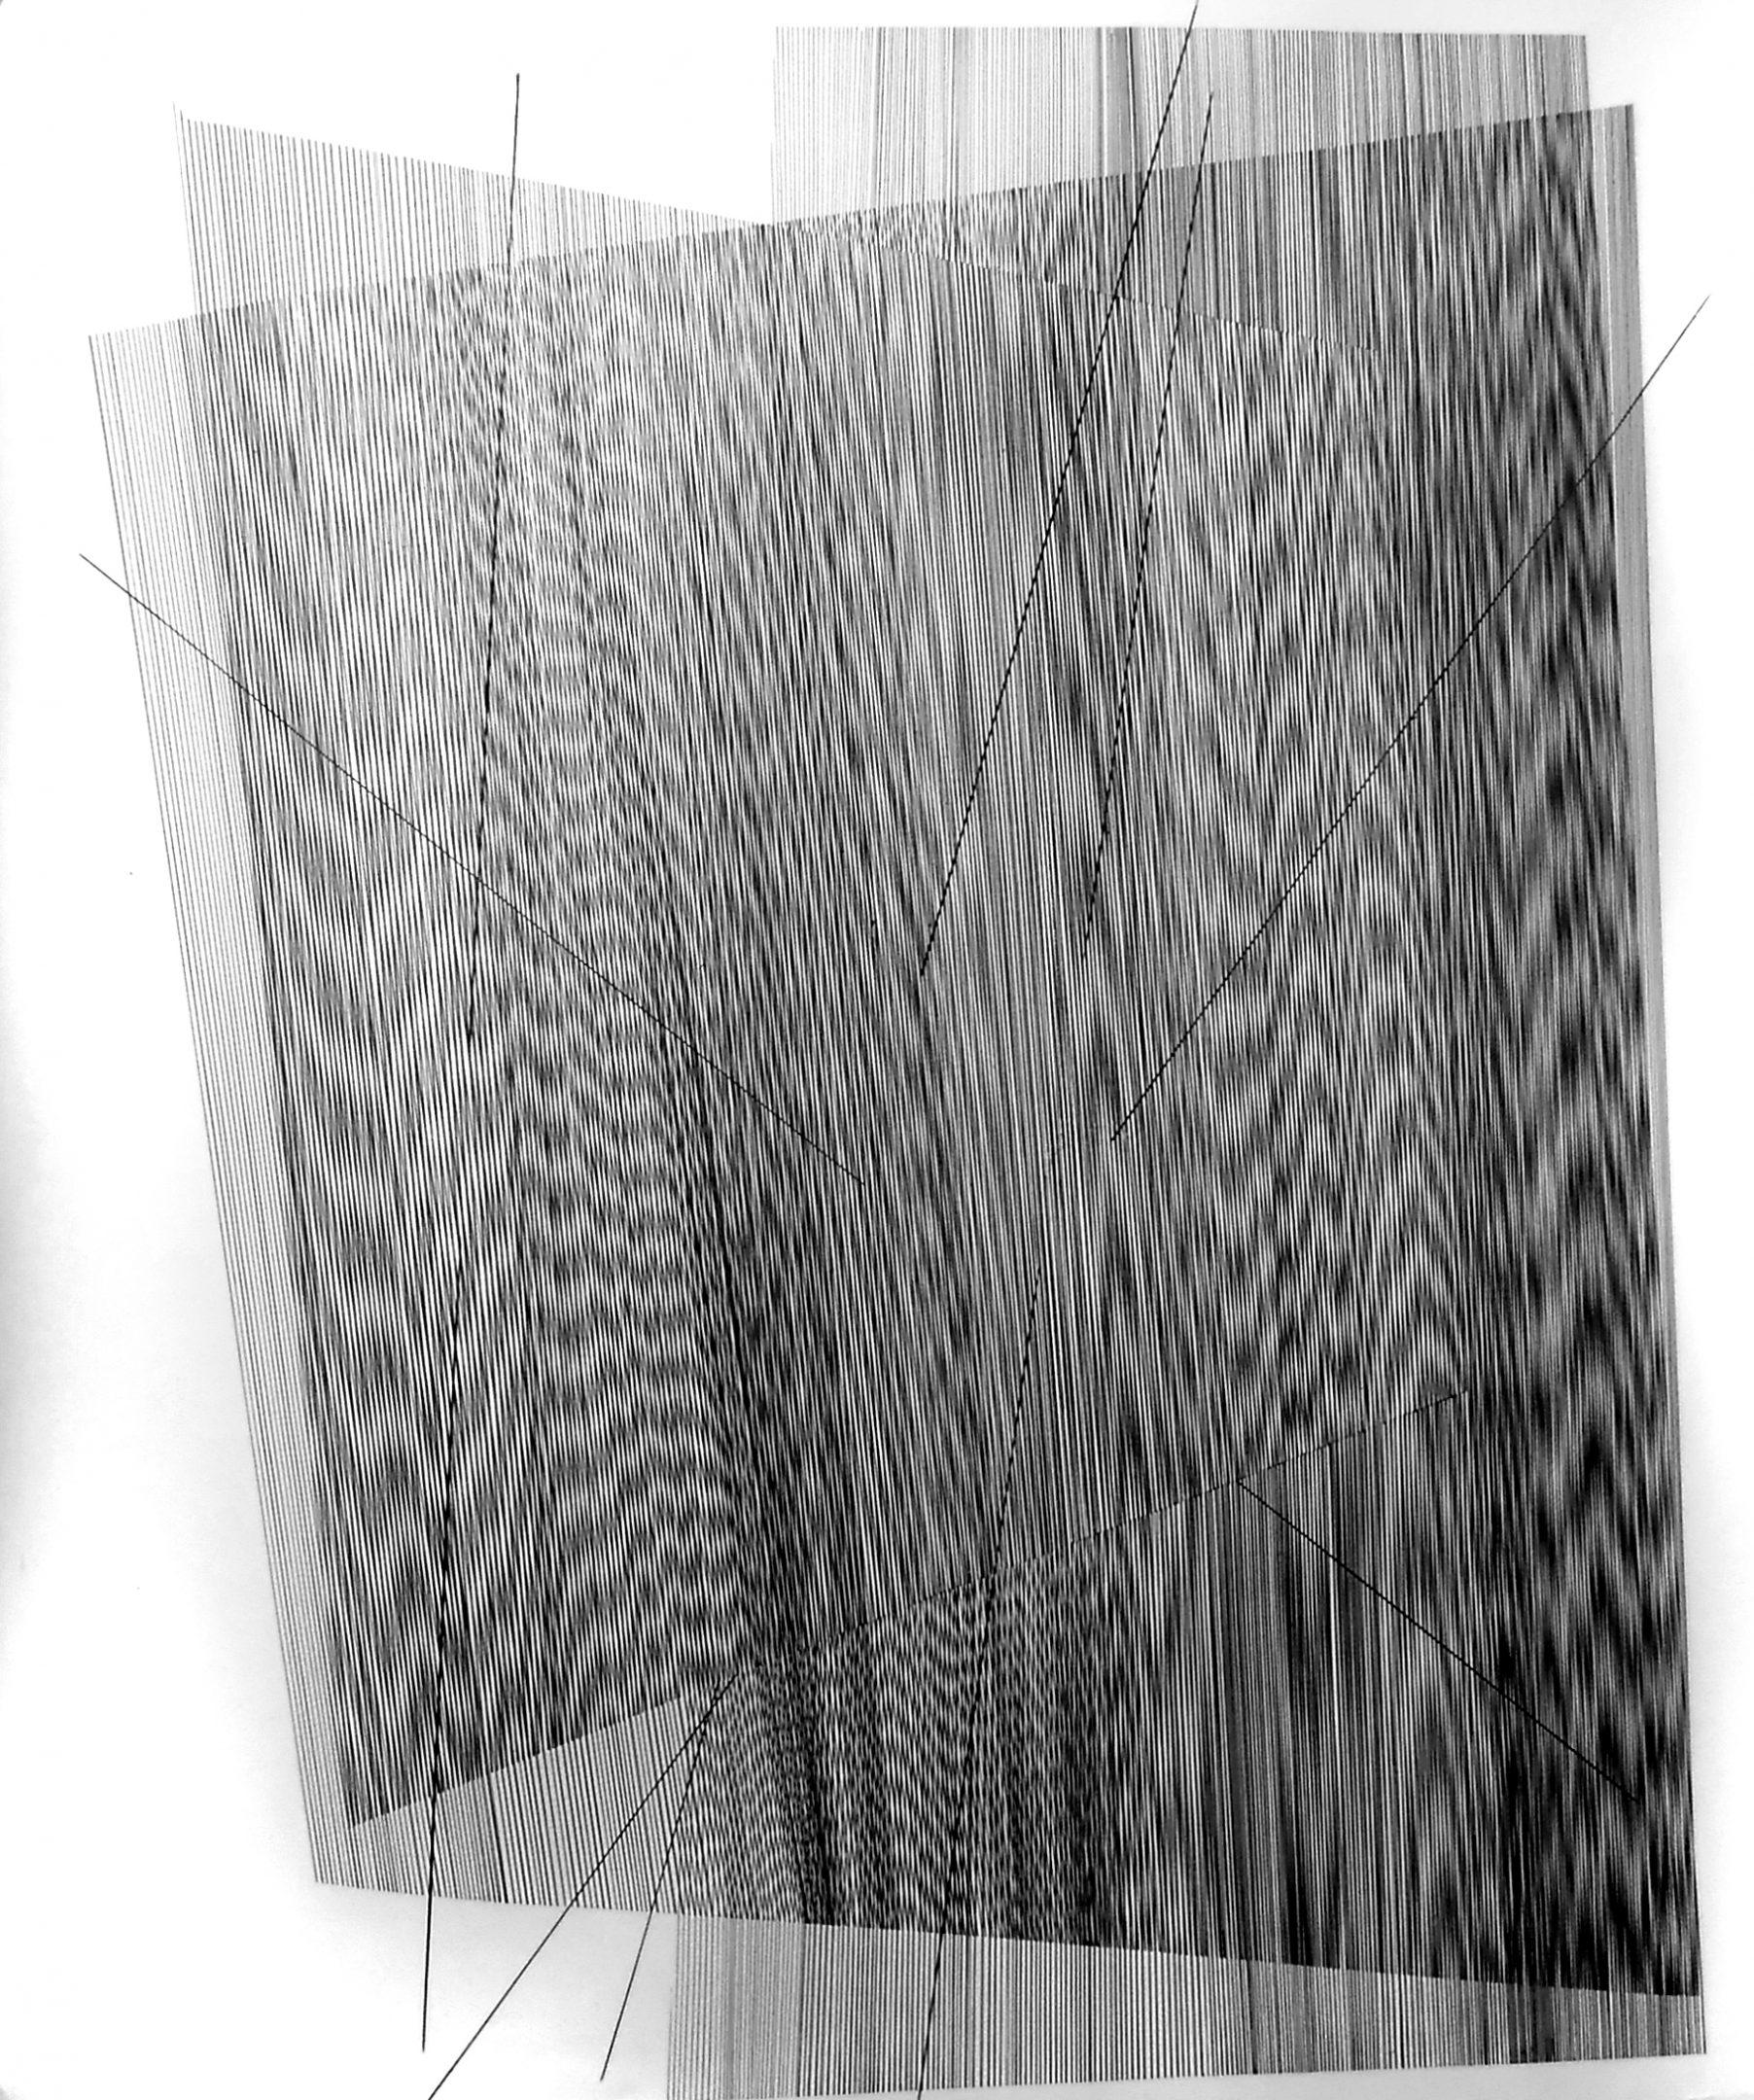 Op. 168. ink on paper, 140x200cm, 2017 - sold